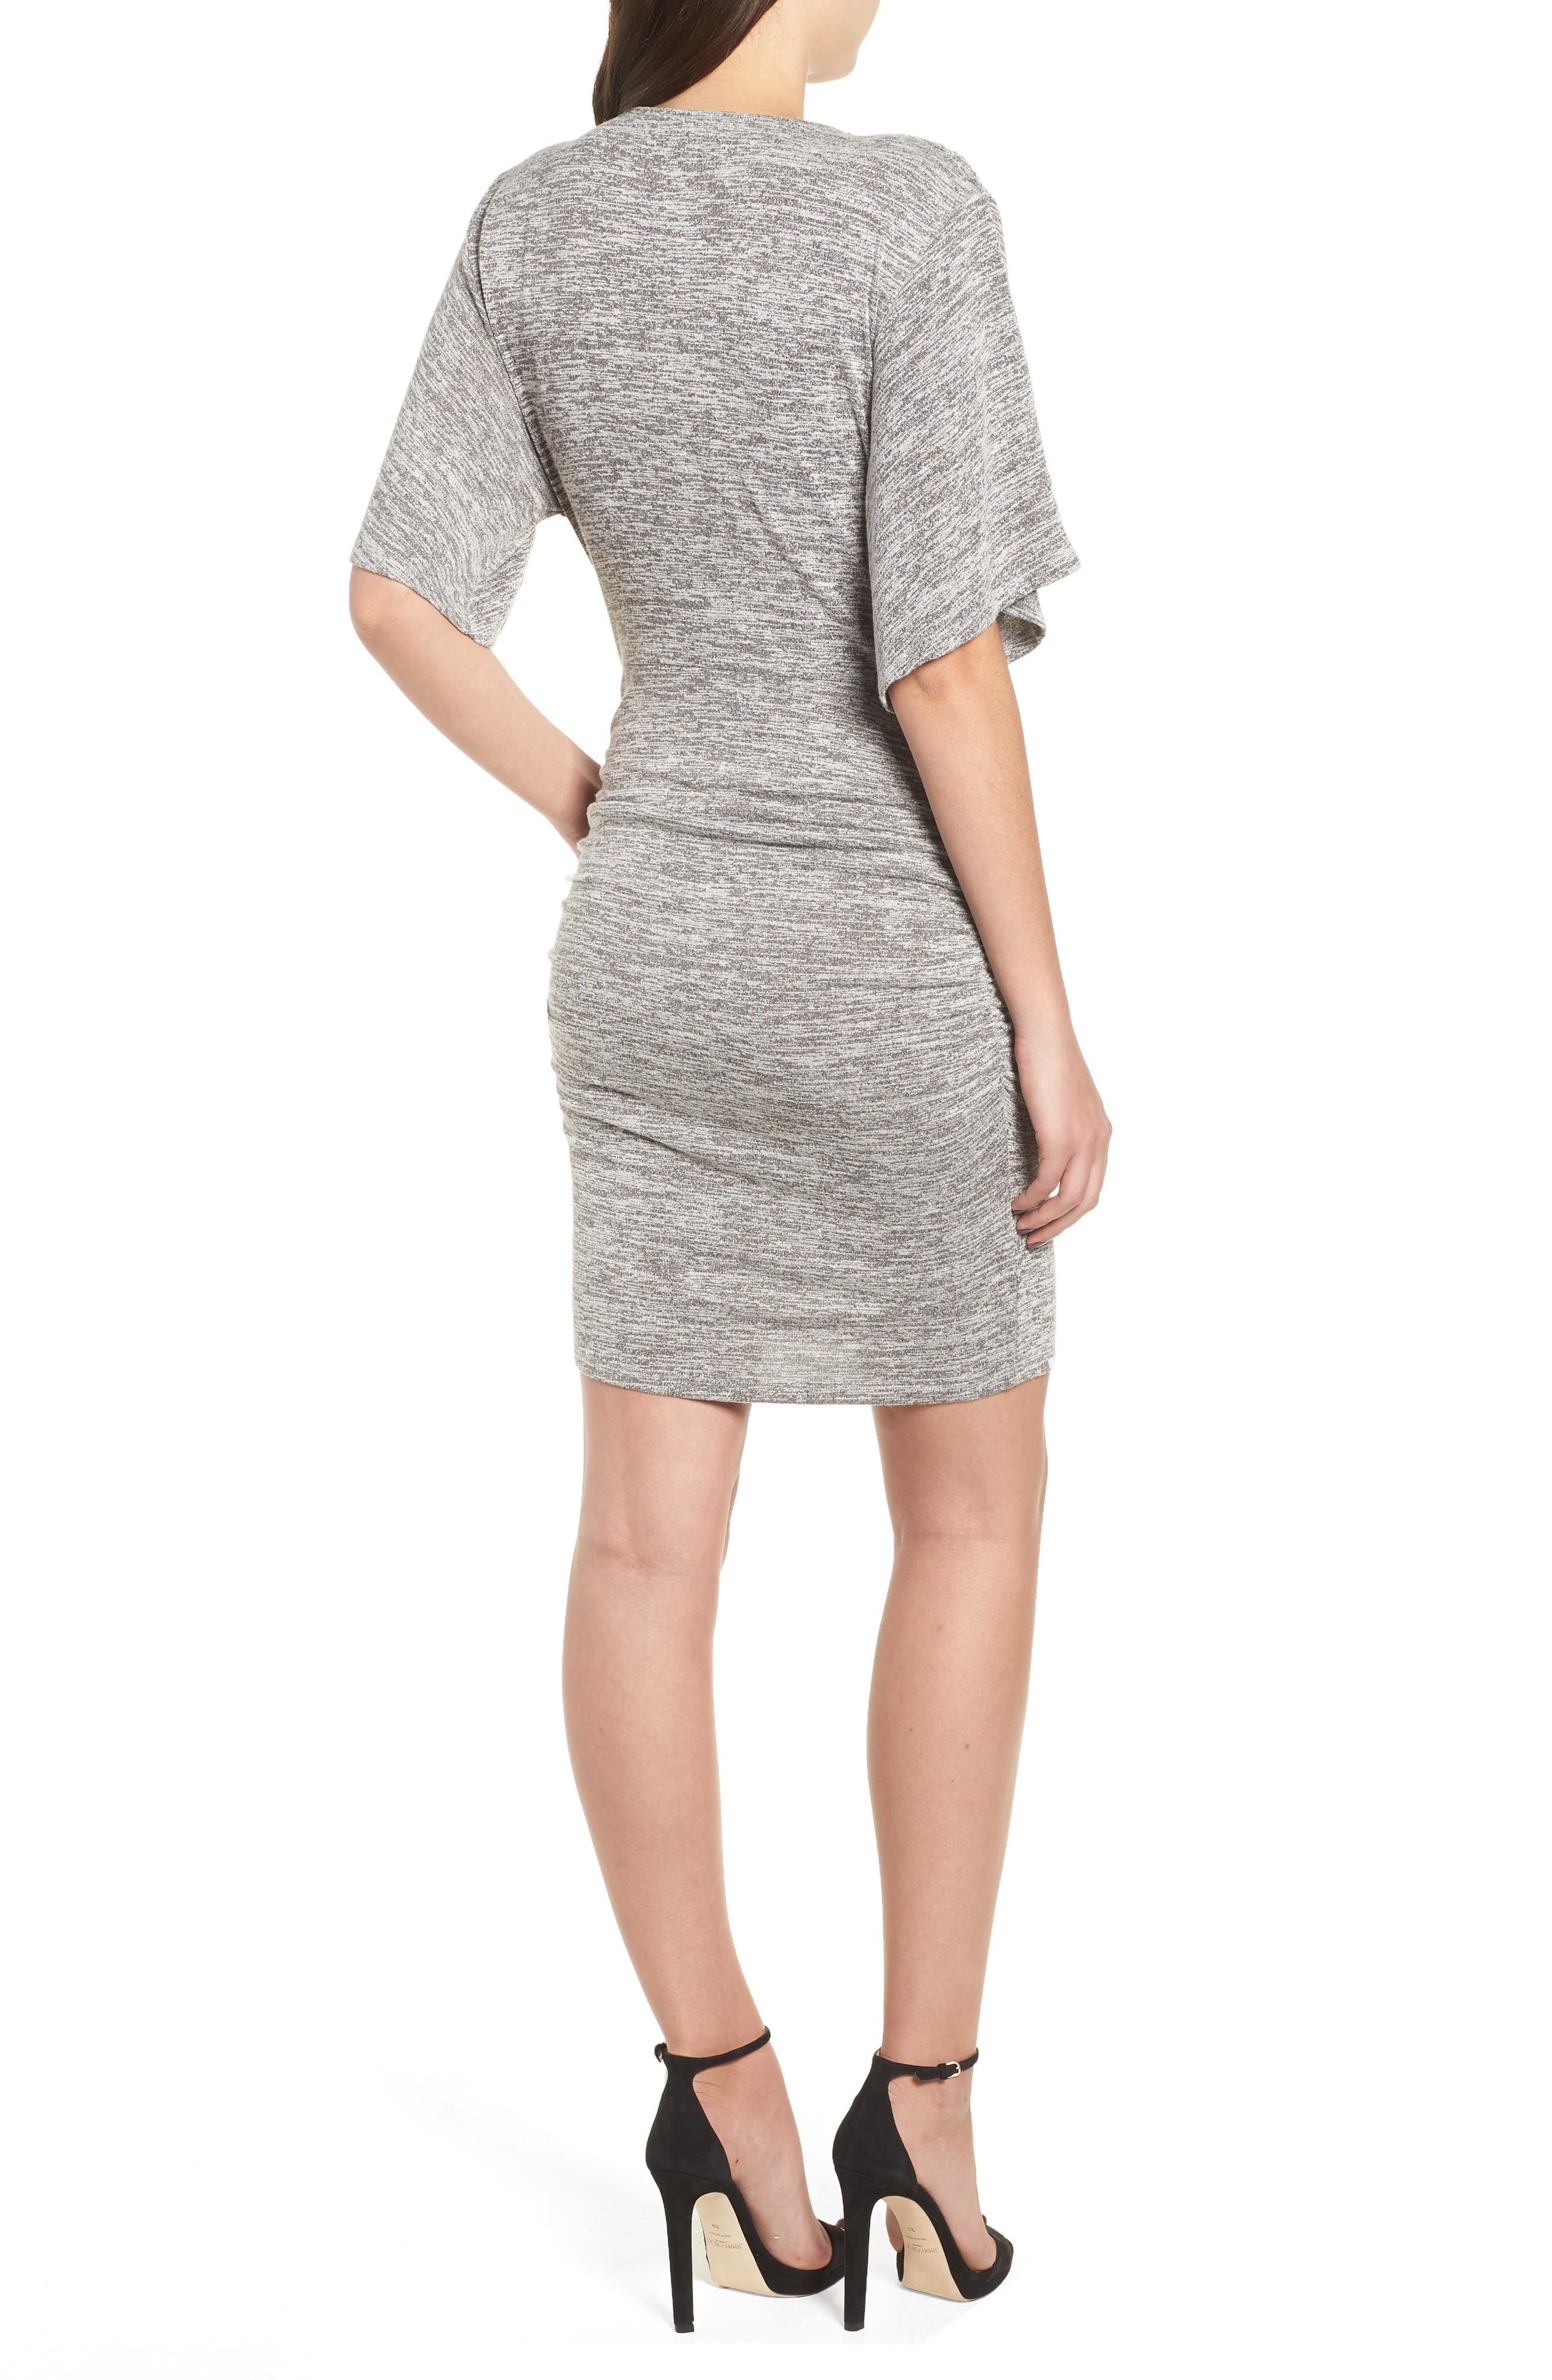 Wrap Dress,                             Alternate thumbnail 2, color,                             GREY CLOUDY HEATHER